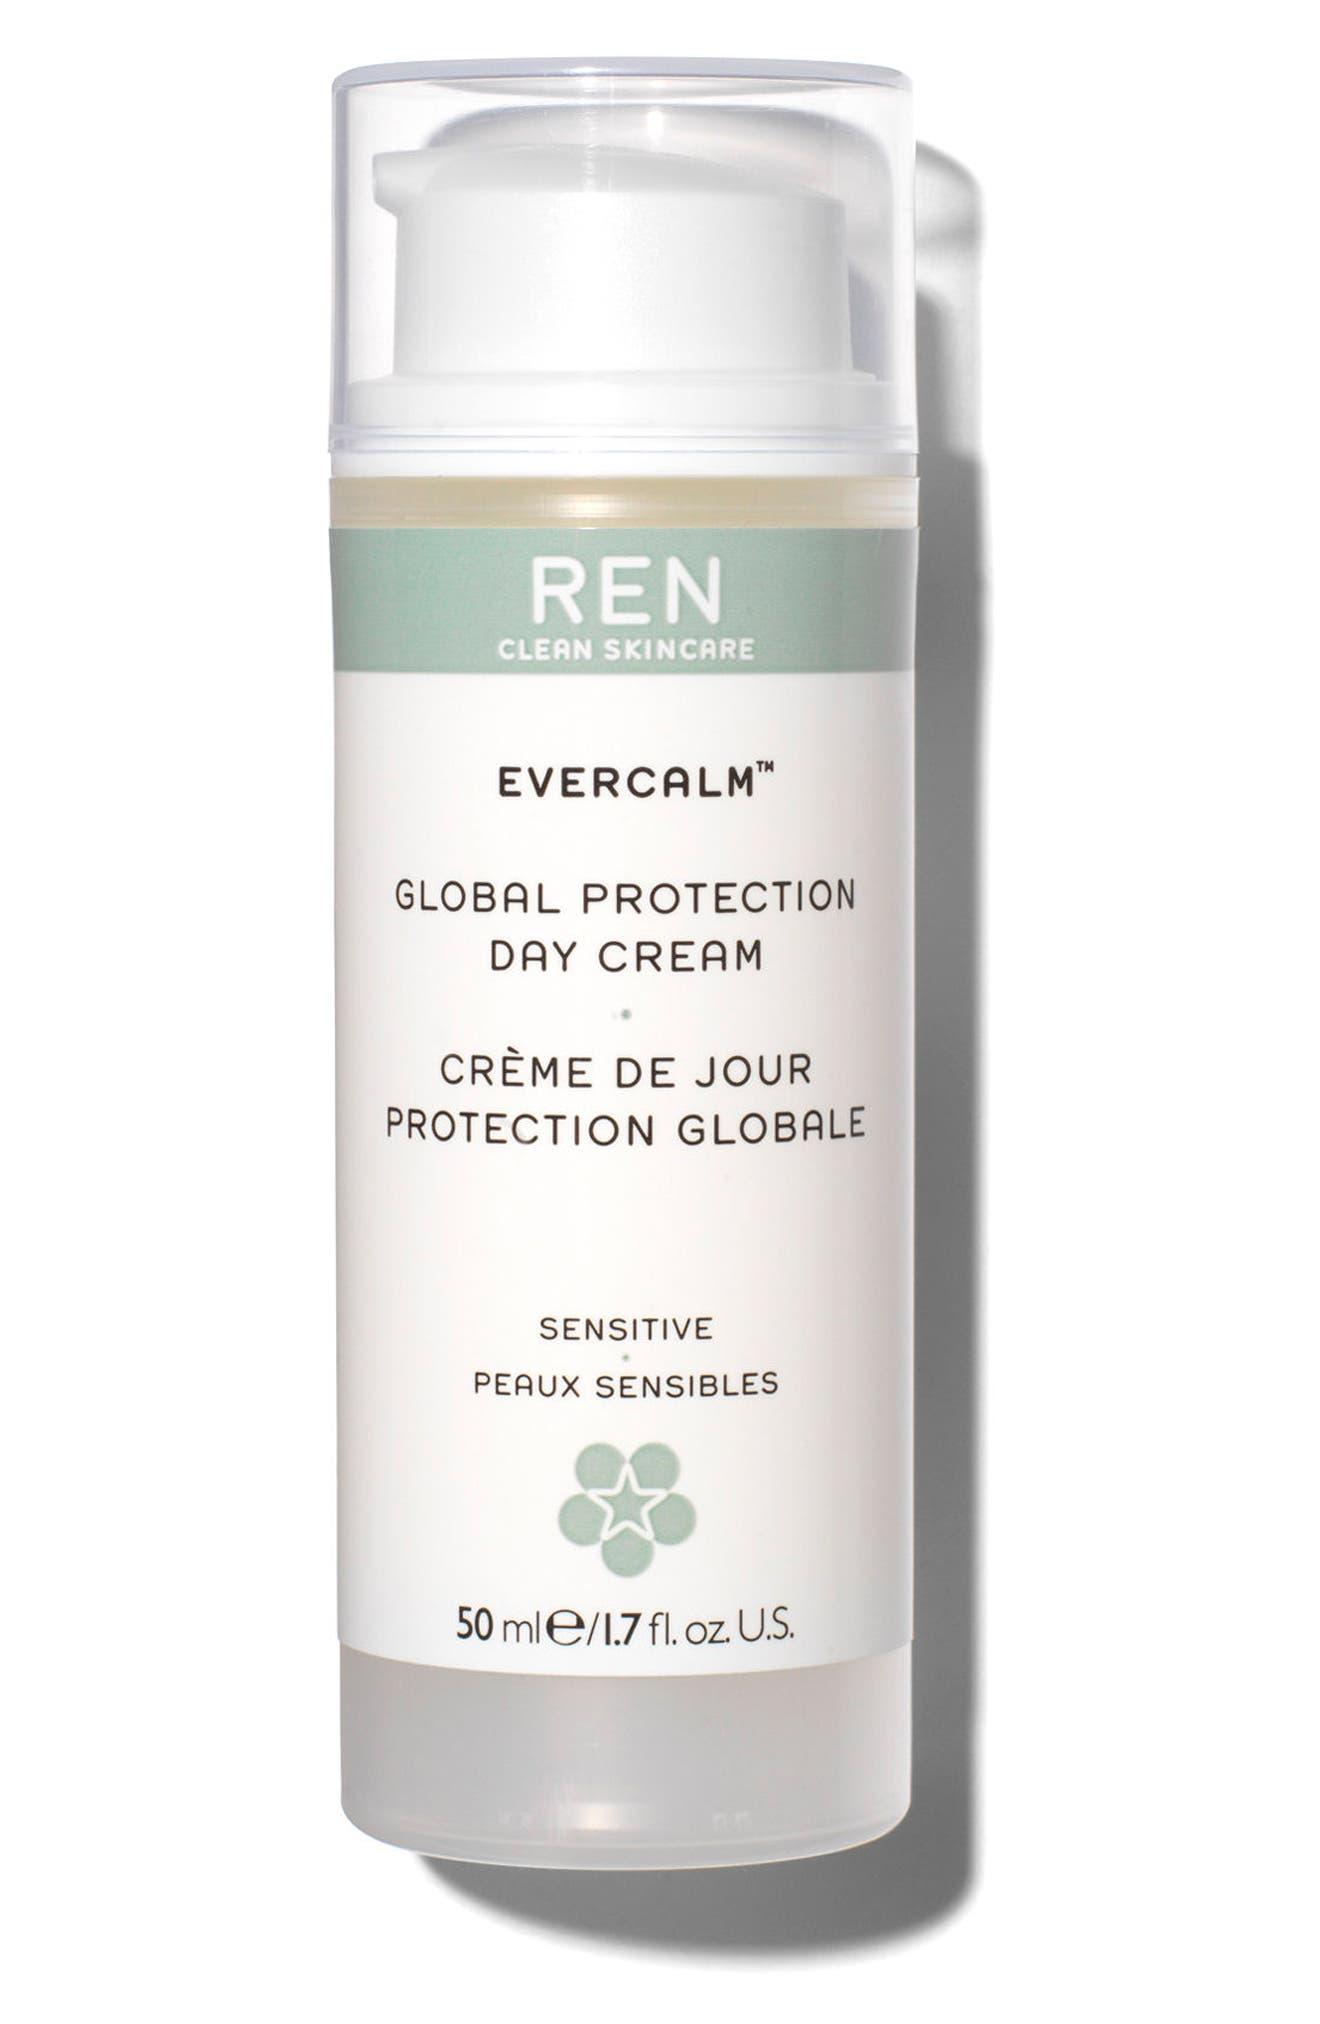 Ren EVERCALM(TM) GLOBAL PROTECTION DAY CREAM